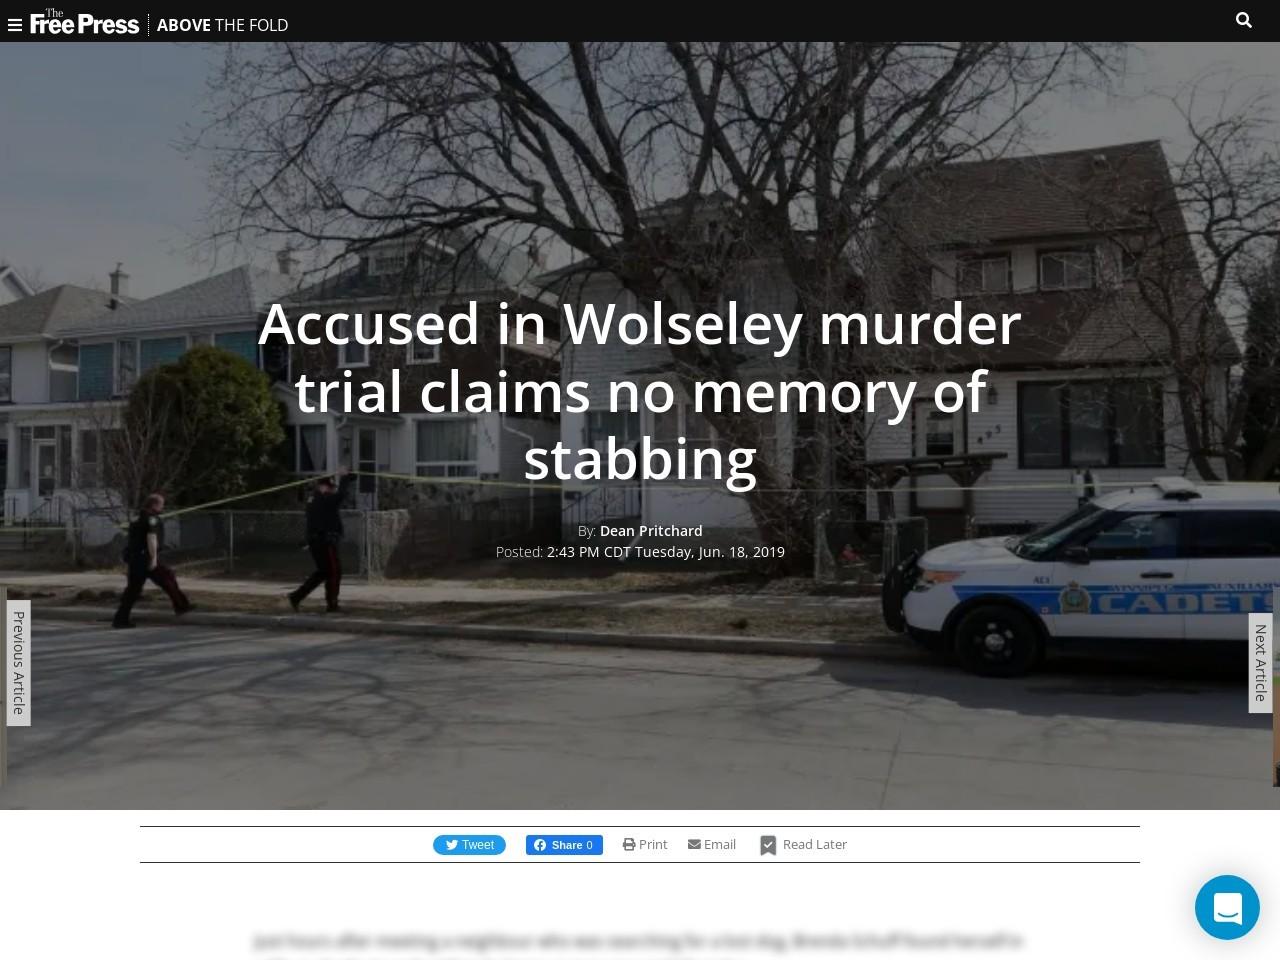 Accused in Wolseley murder trial claims no memory of stabbing